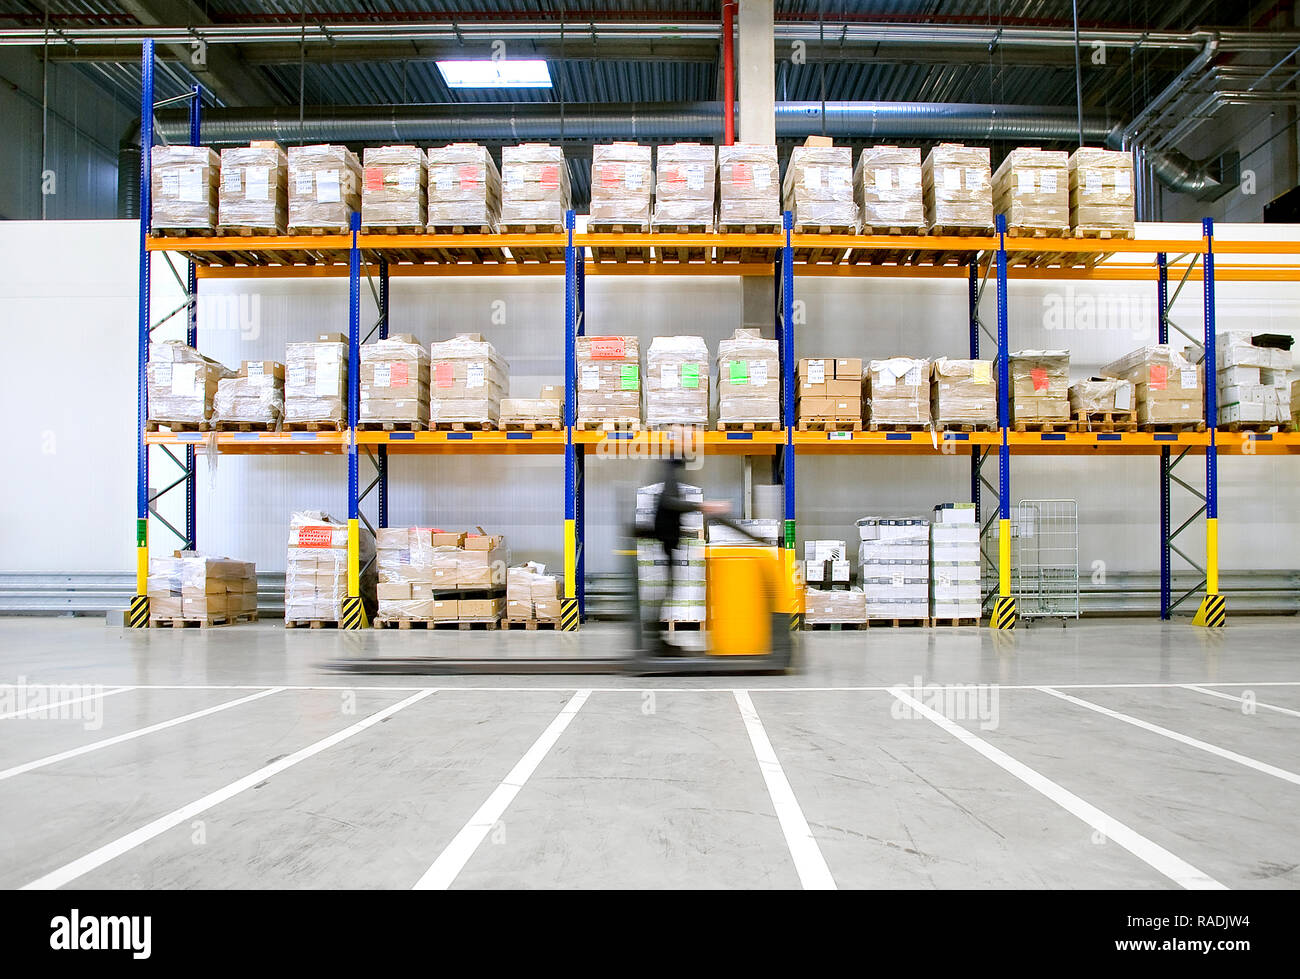 Lidl's logistics center - Stock Image